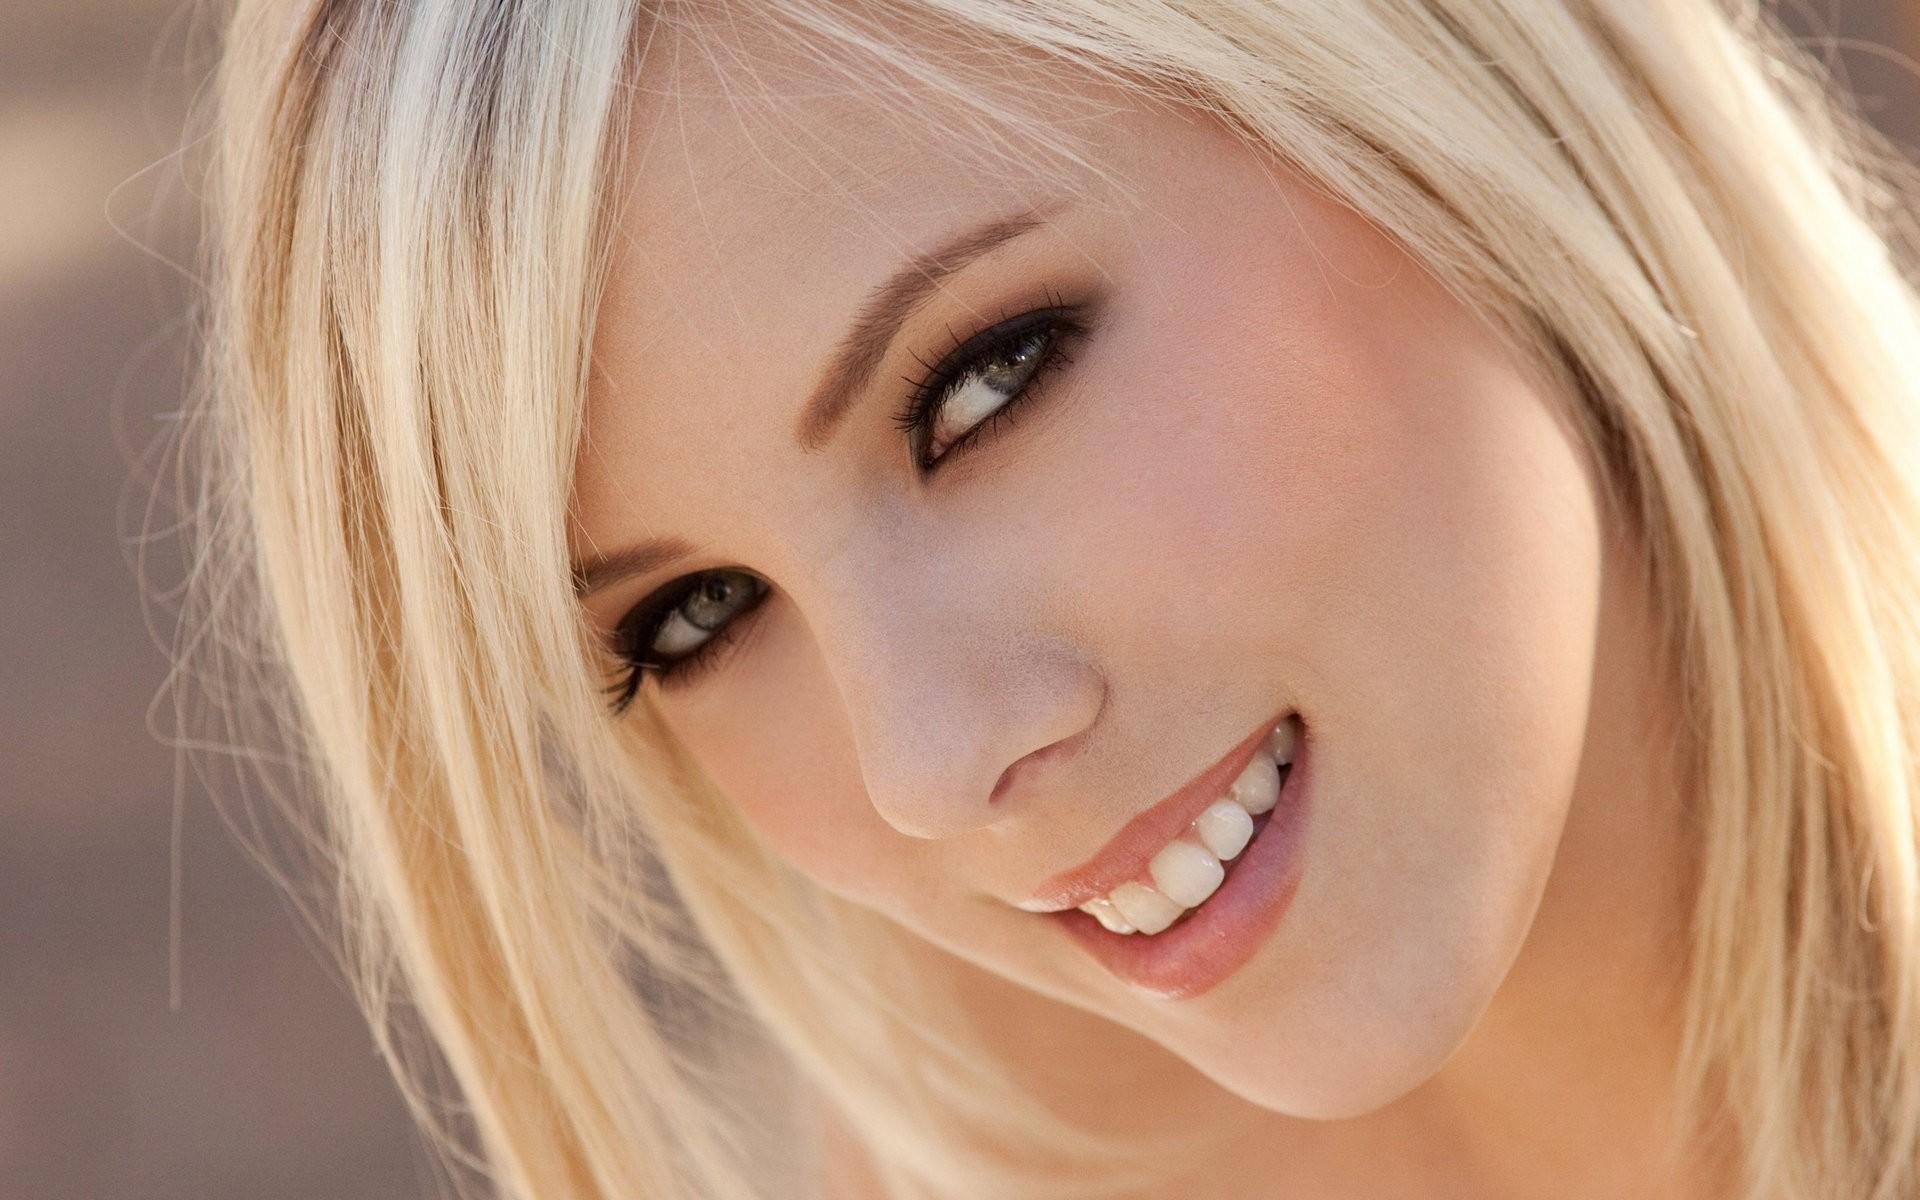 People 1920x1200 face model Bibi Jones women blonde smiling Digital Desire